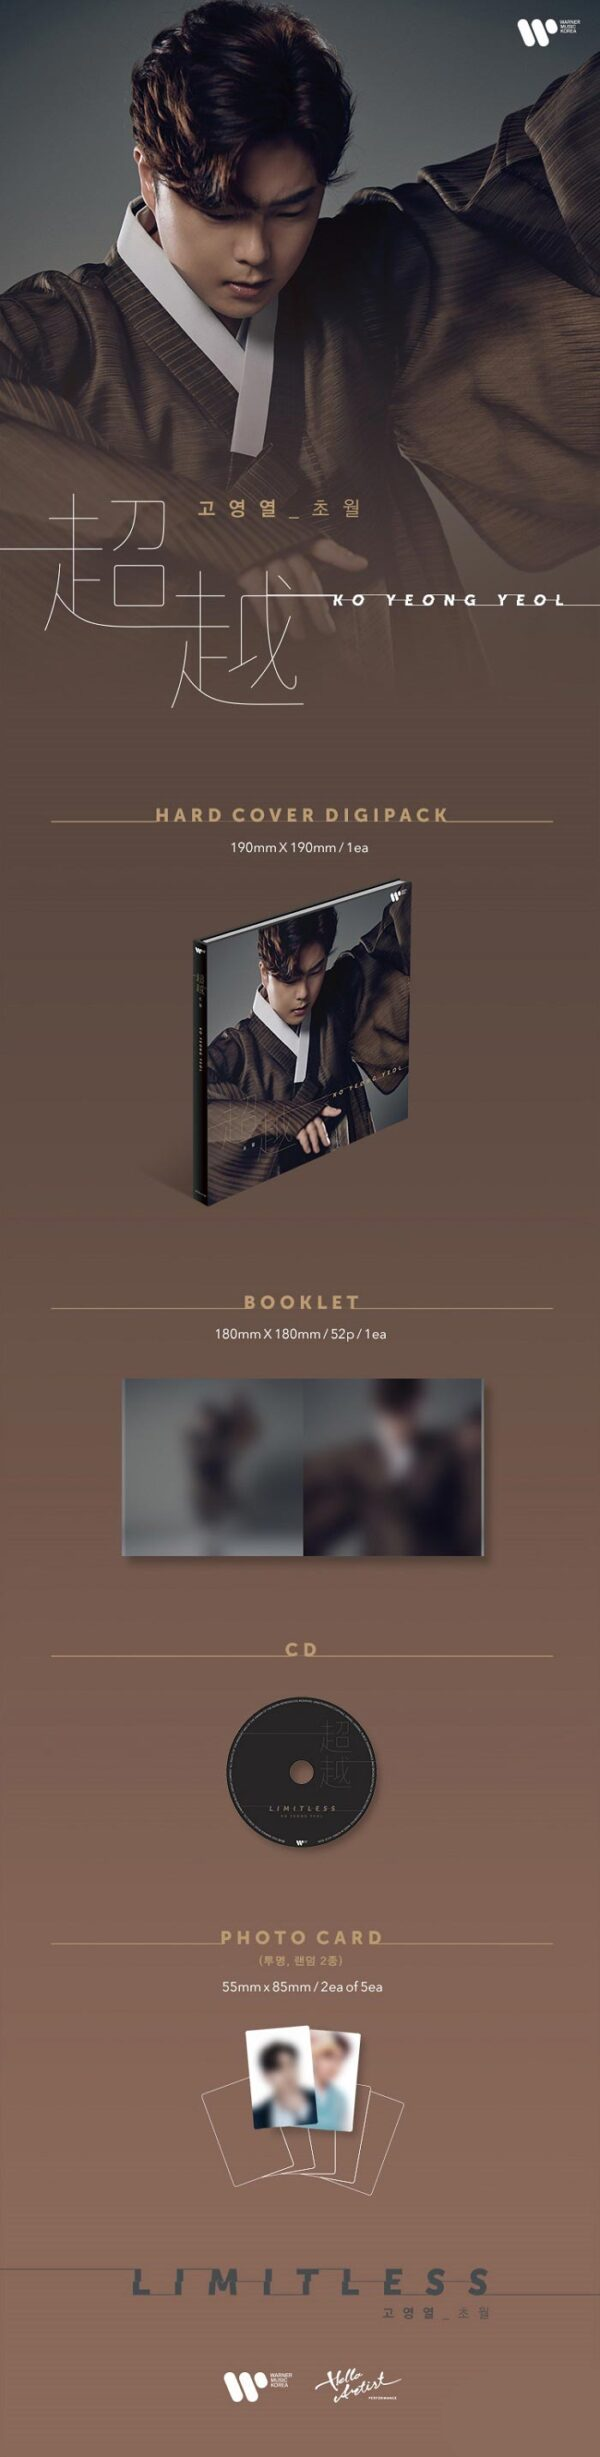 2st Album de KO YEONG YEOL LIMITLESS